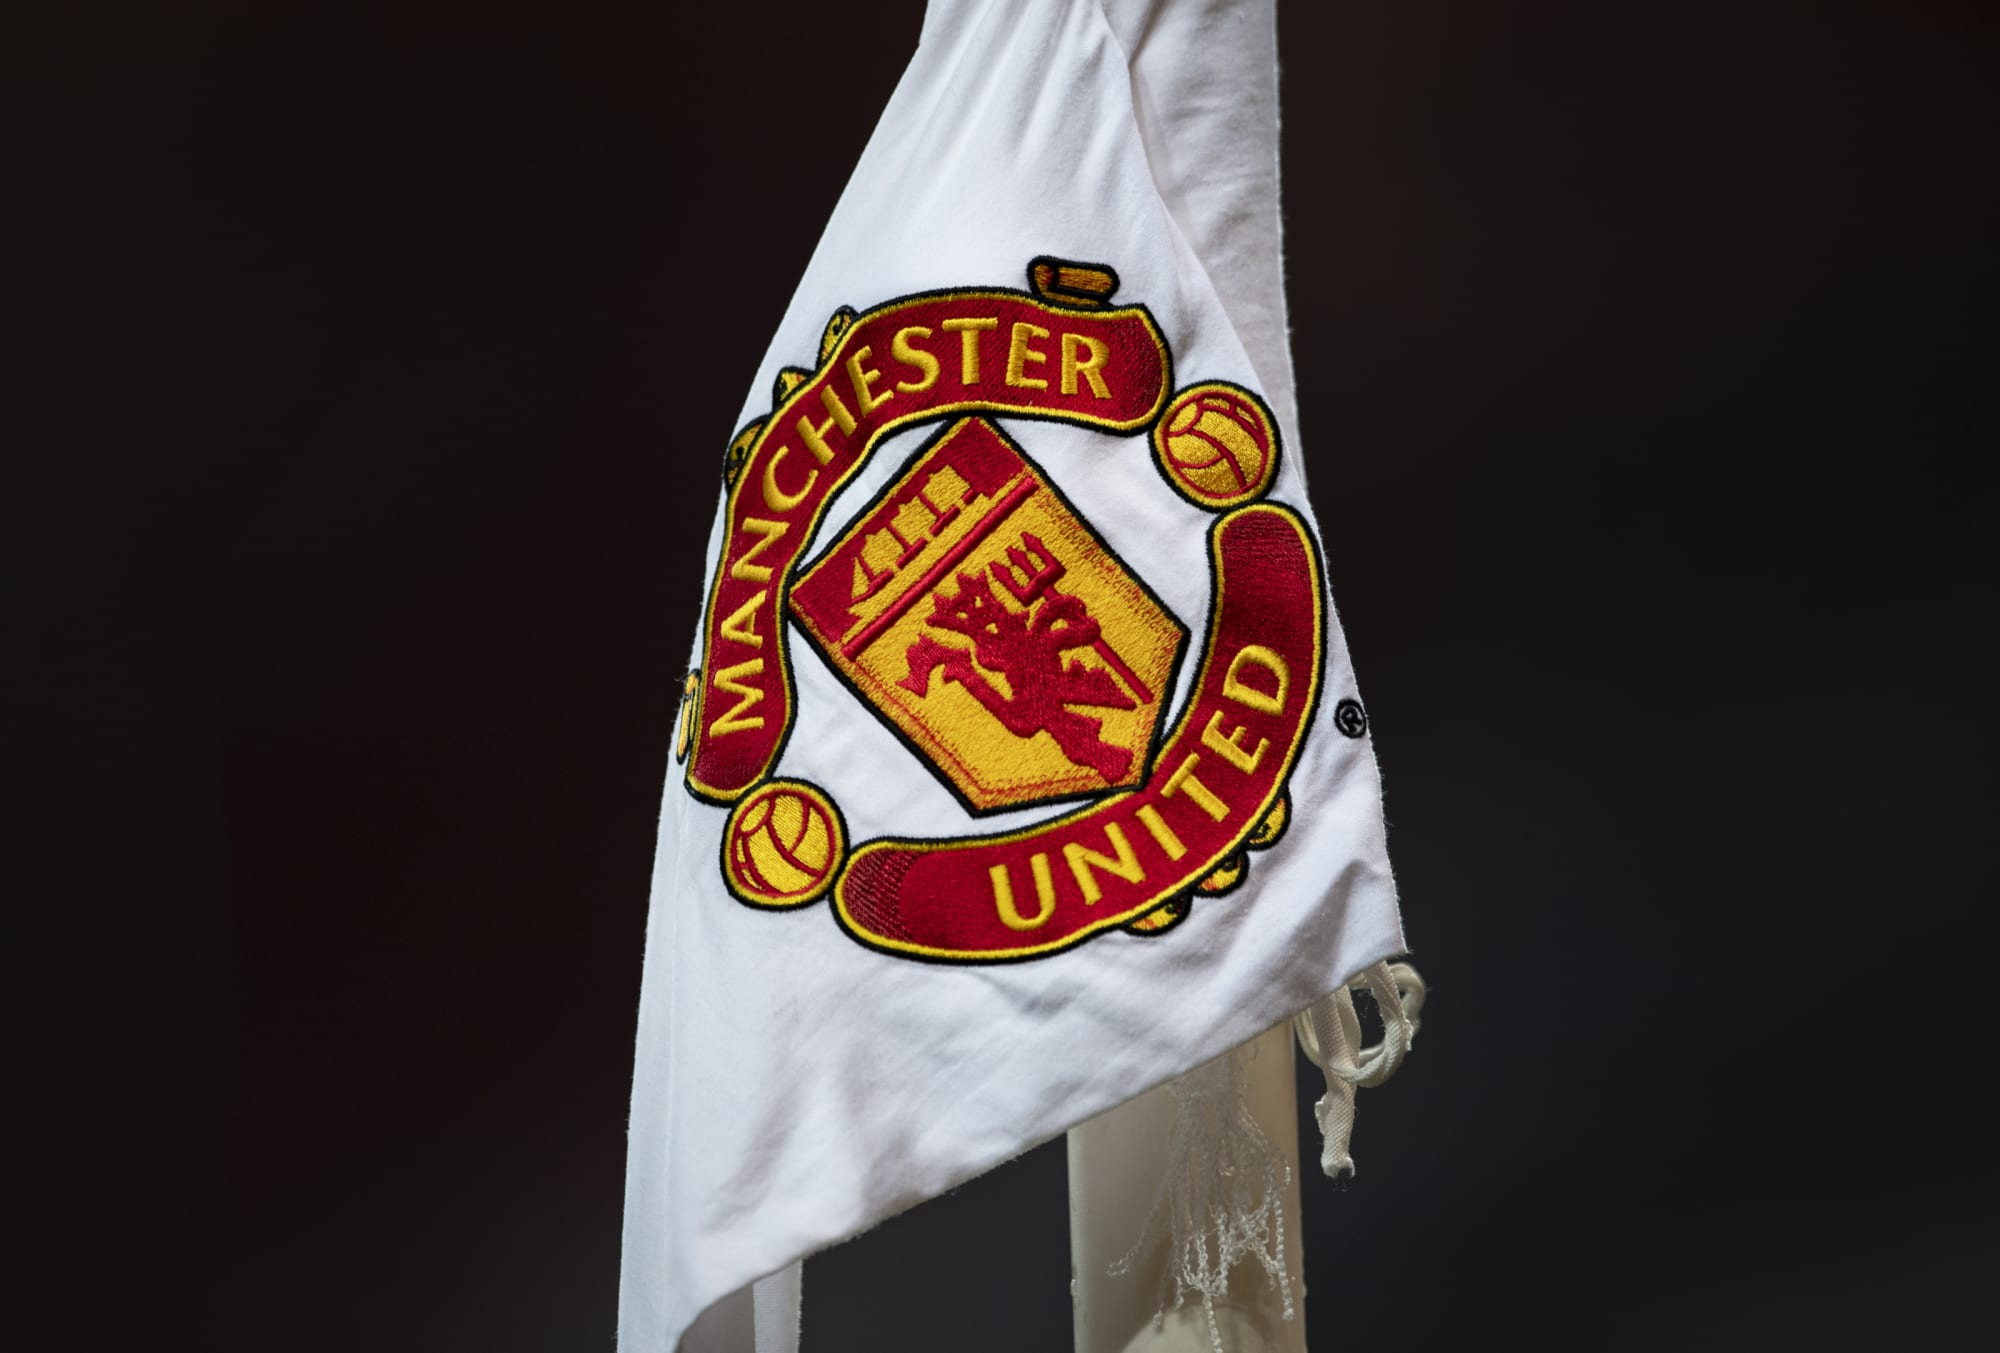 Manchester United won't make move for £100 million star